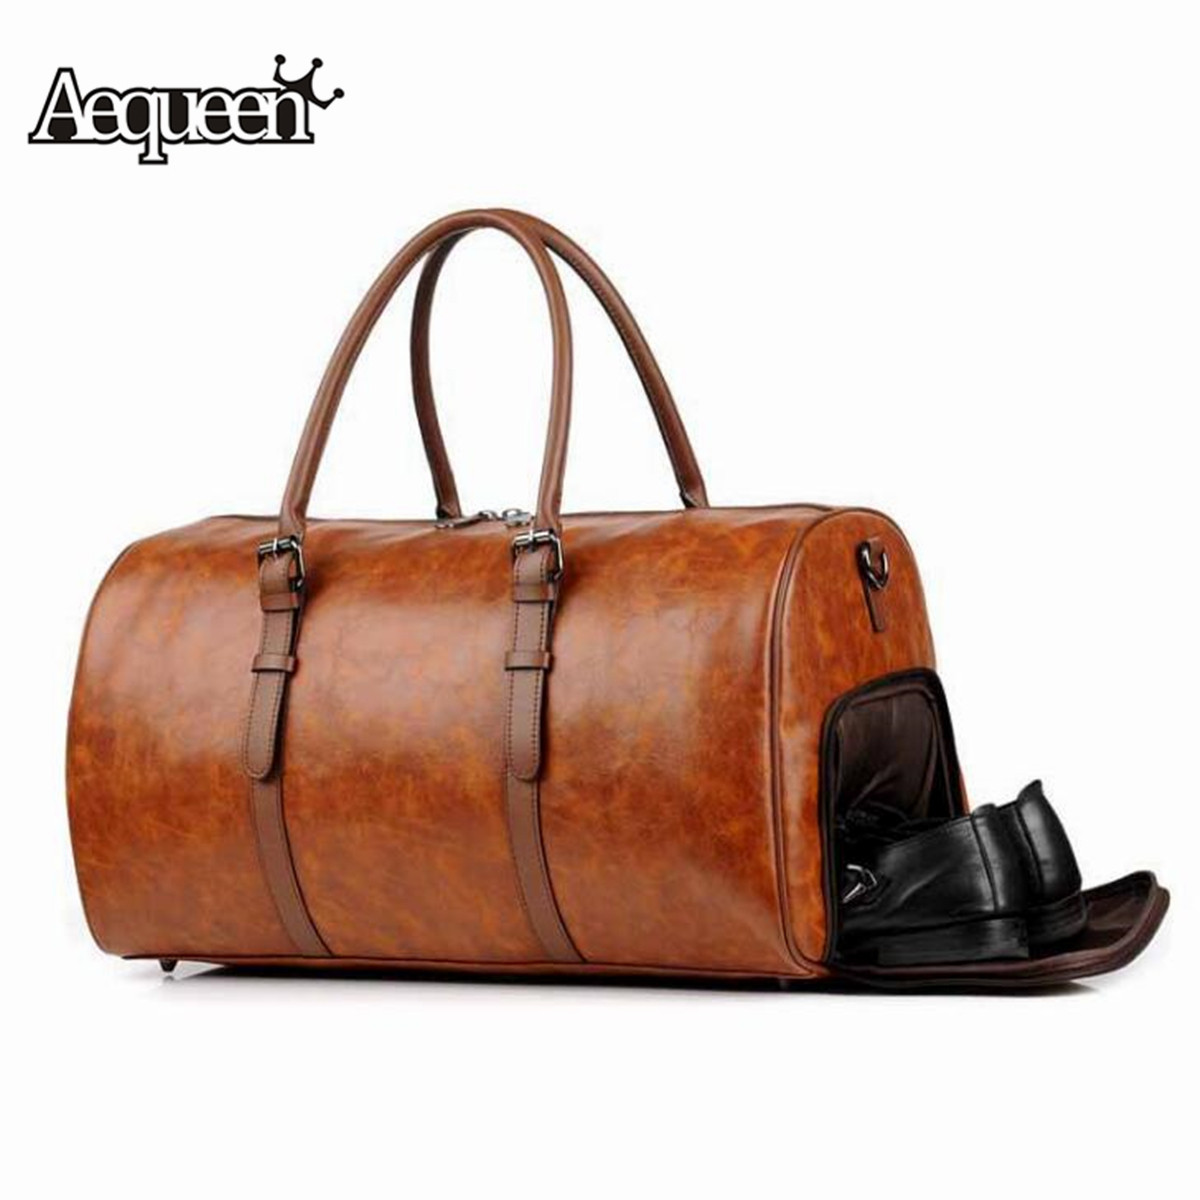 AEQUEEN Men Women PU Leather Travel Hand Bag Outdoor Gym Duffel Bag Weekender Overnight Luggage Handbag Waterproof Large Totes